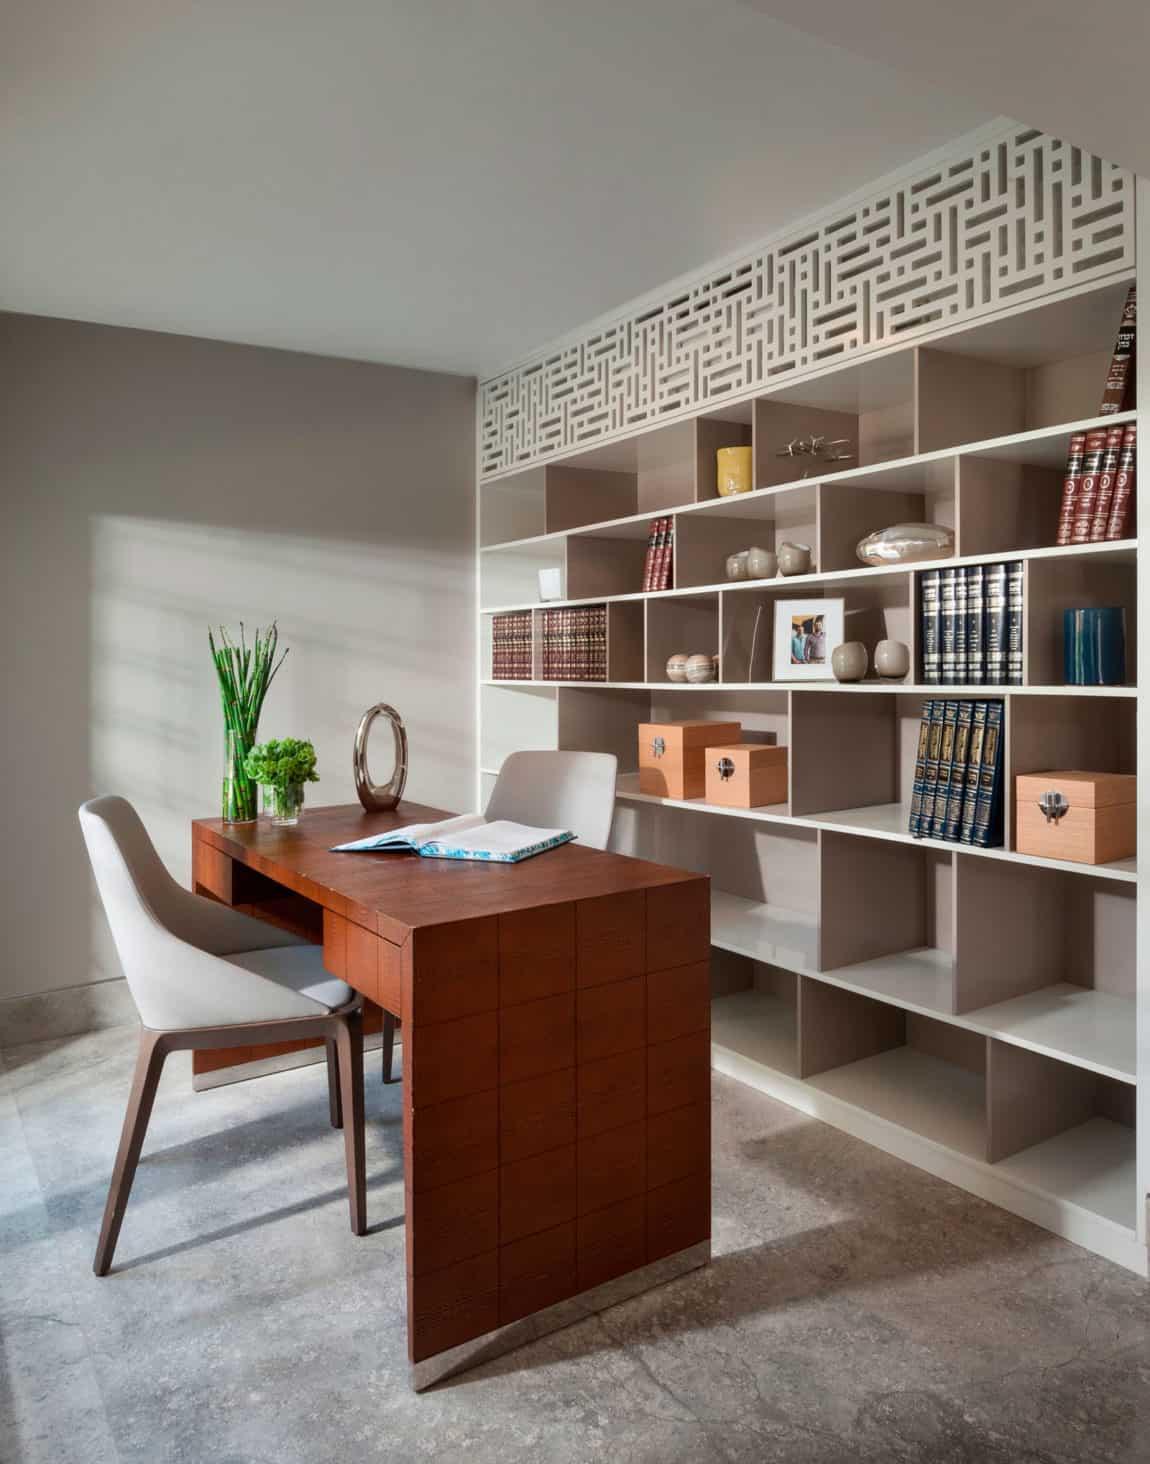 Modern Garden Apartment by Annette Frommer (4)